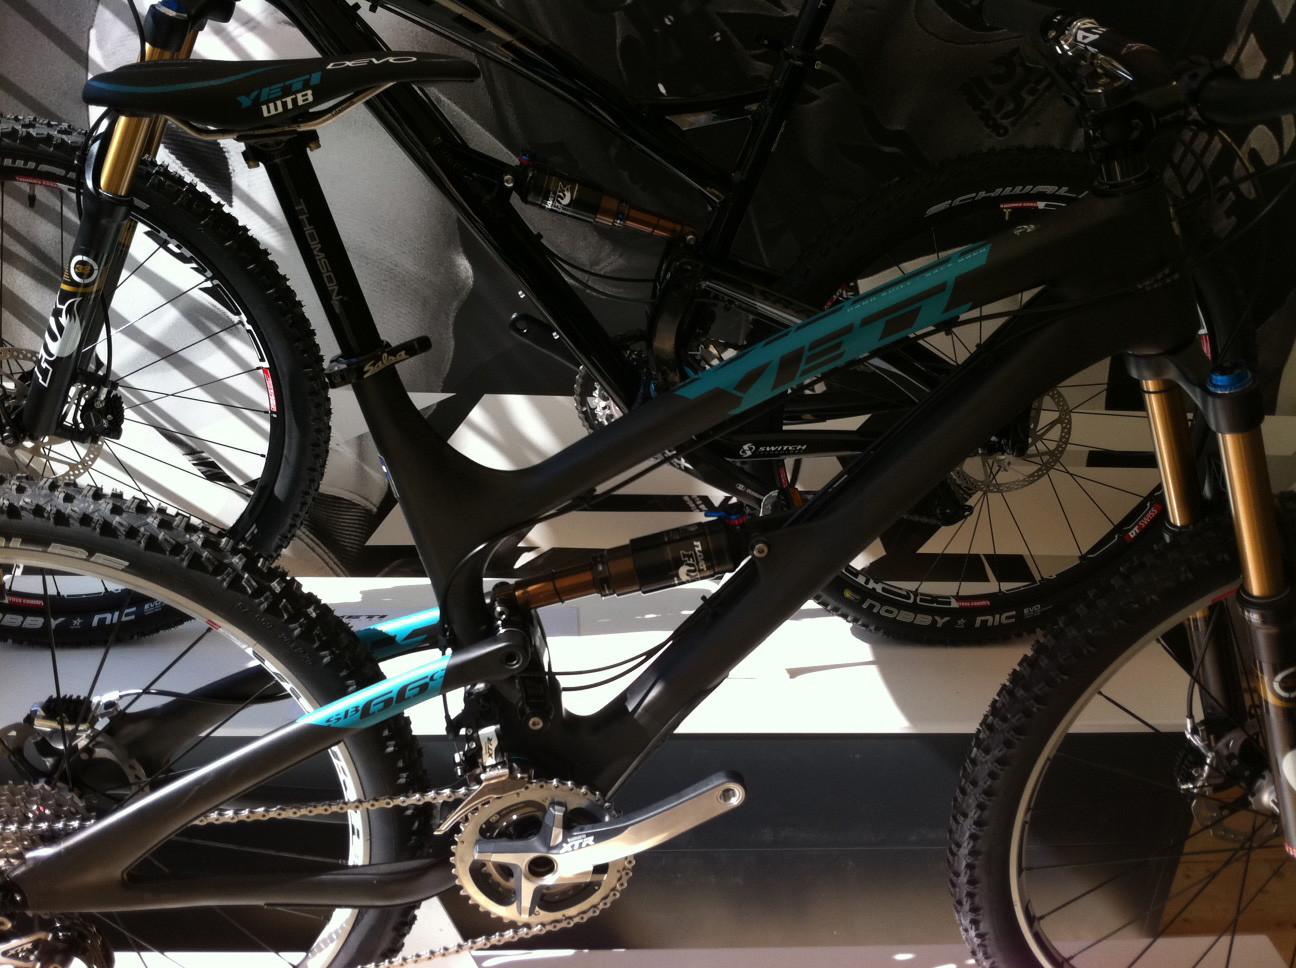 Yeti SB-66c - Eurobike 2011 - Mountain Biking Pictures - Vital MTB